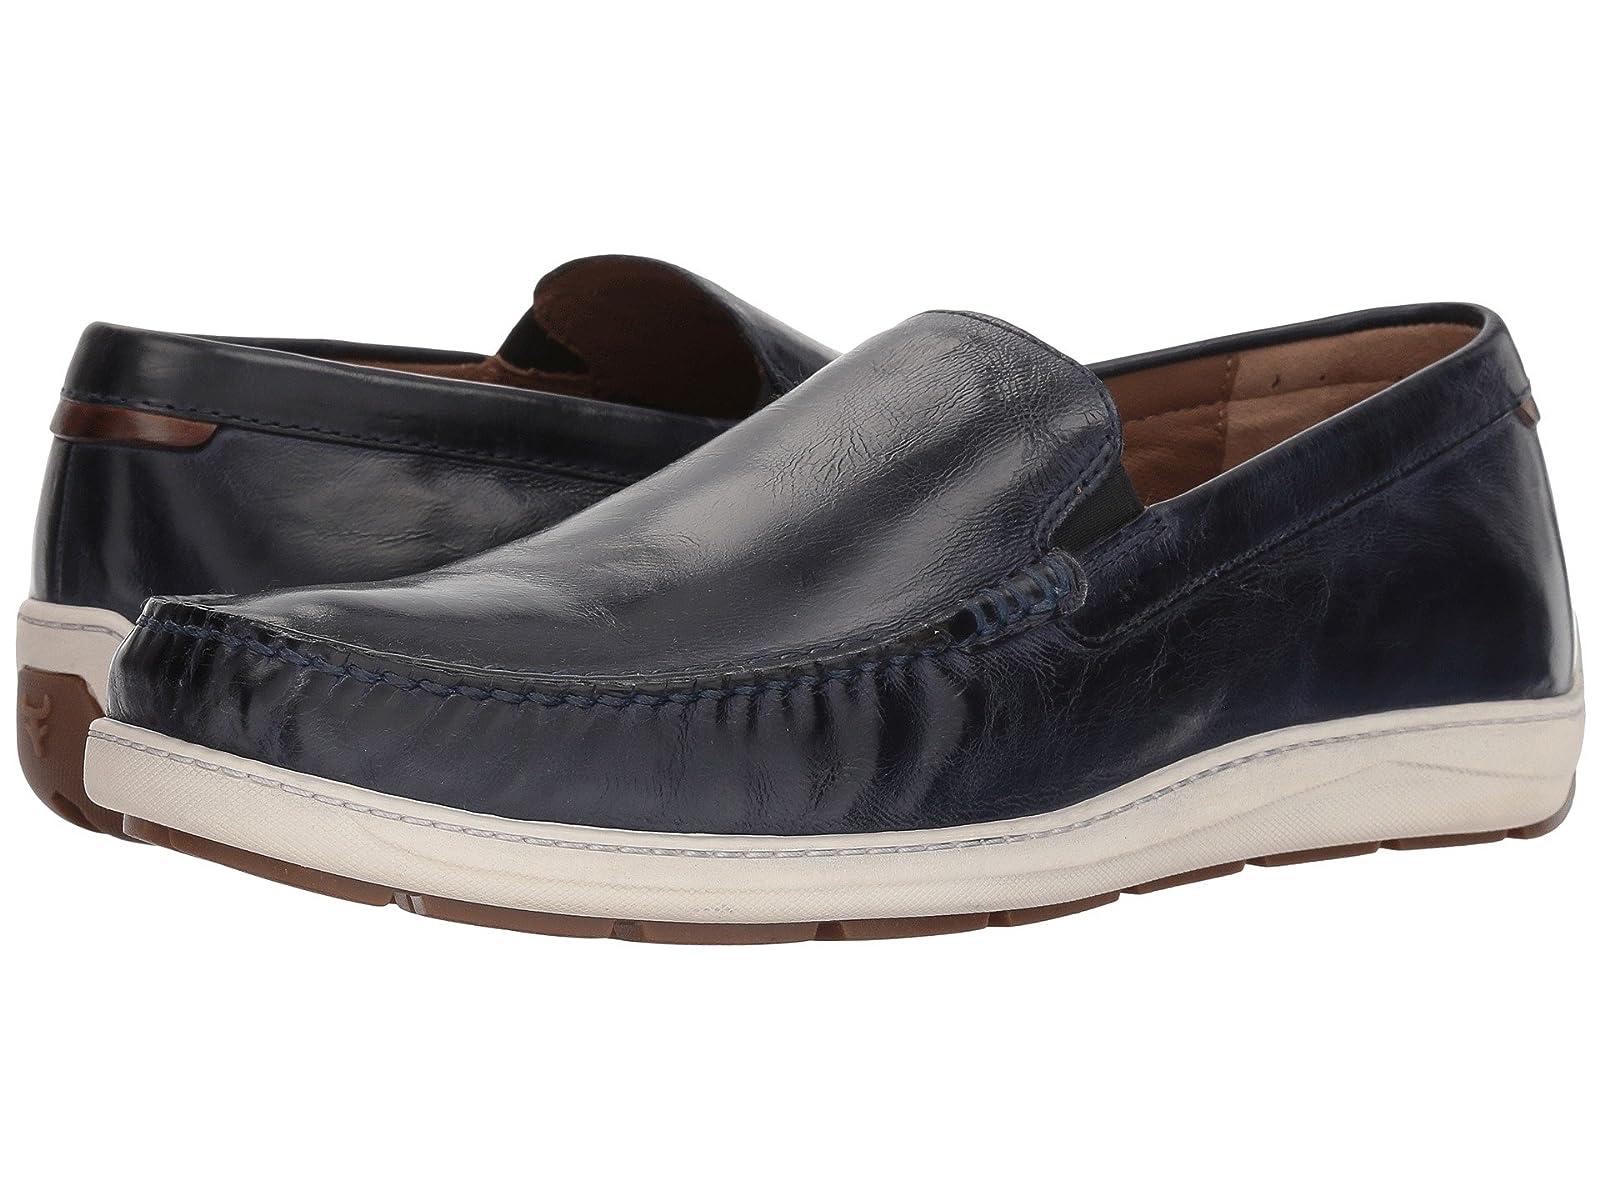 Trask SherwoodAtmospheric grades have affordable shoes